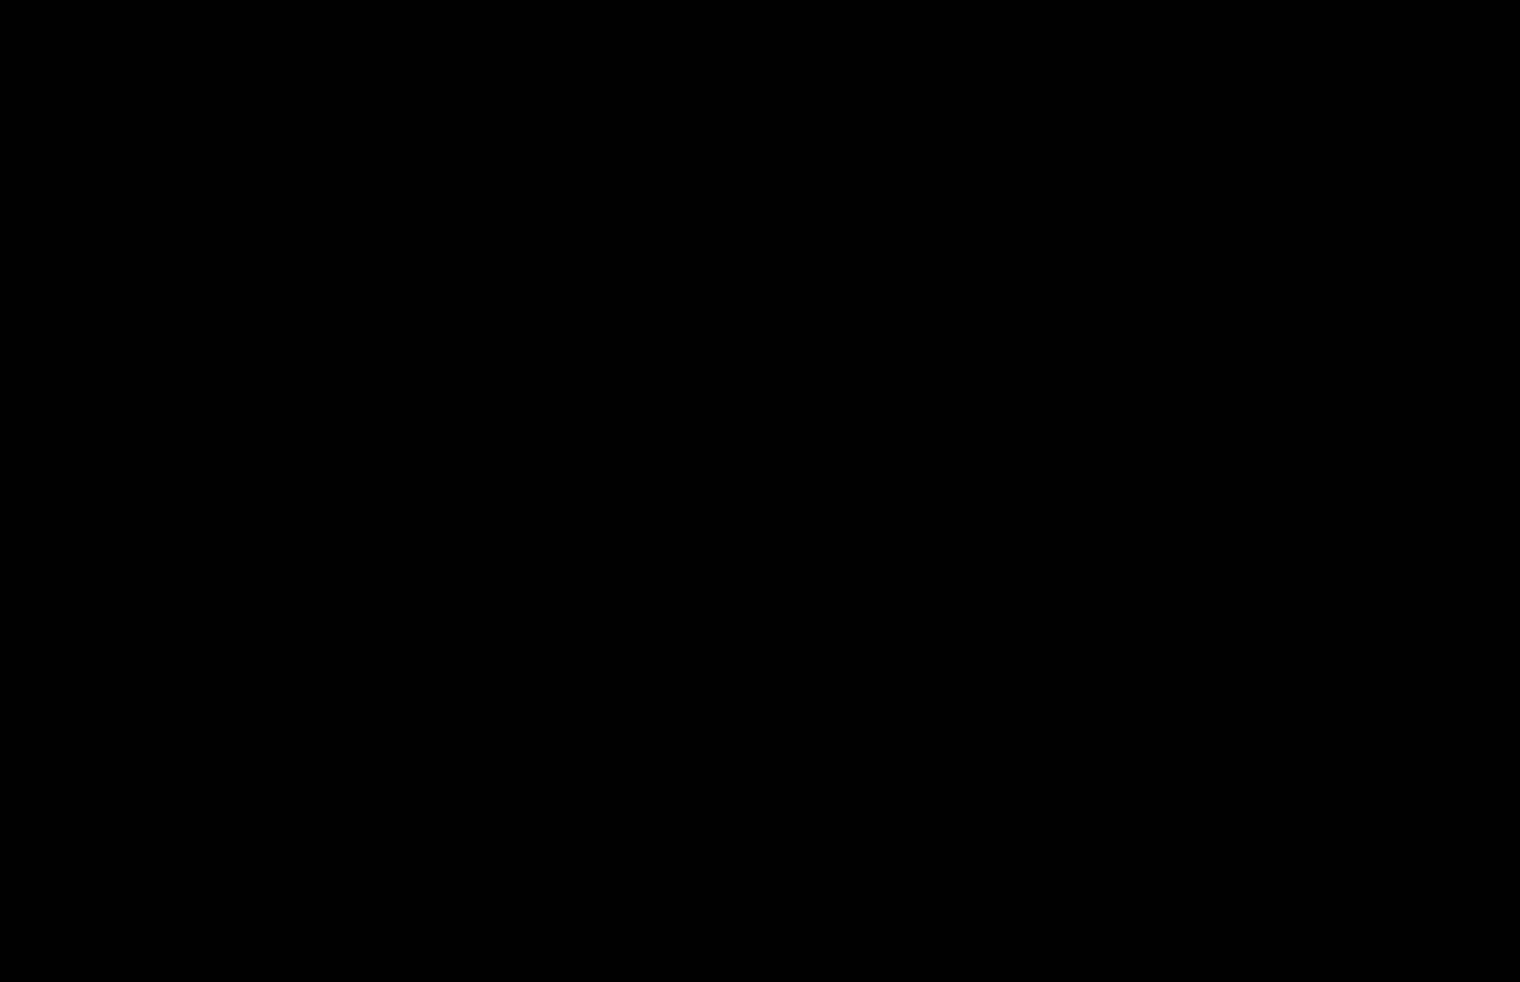 DOMETIC brand logo